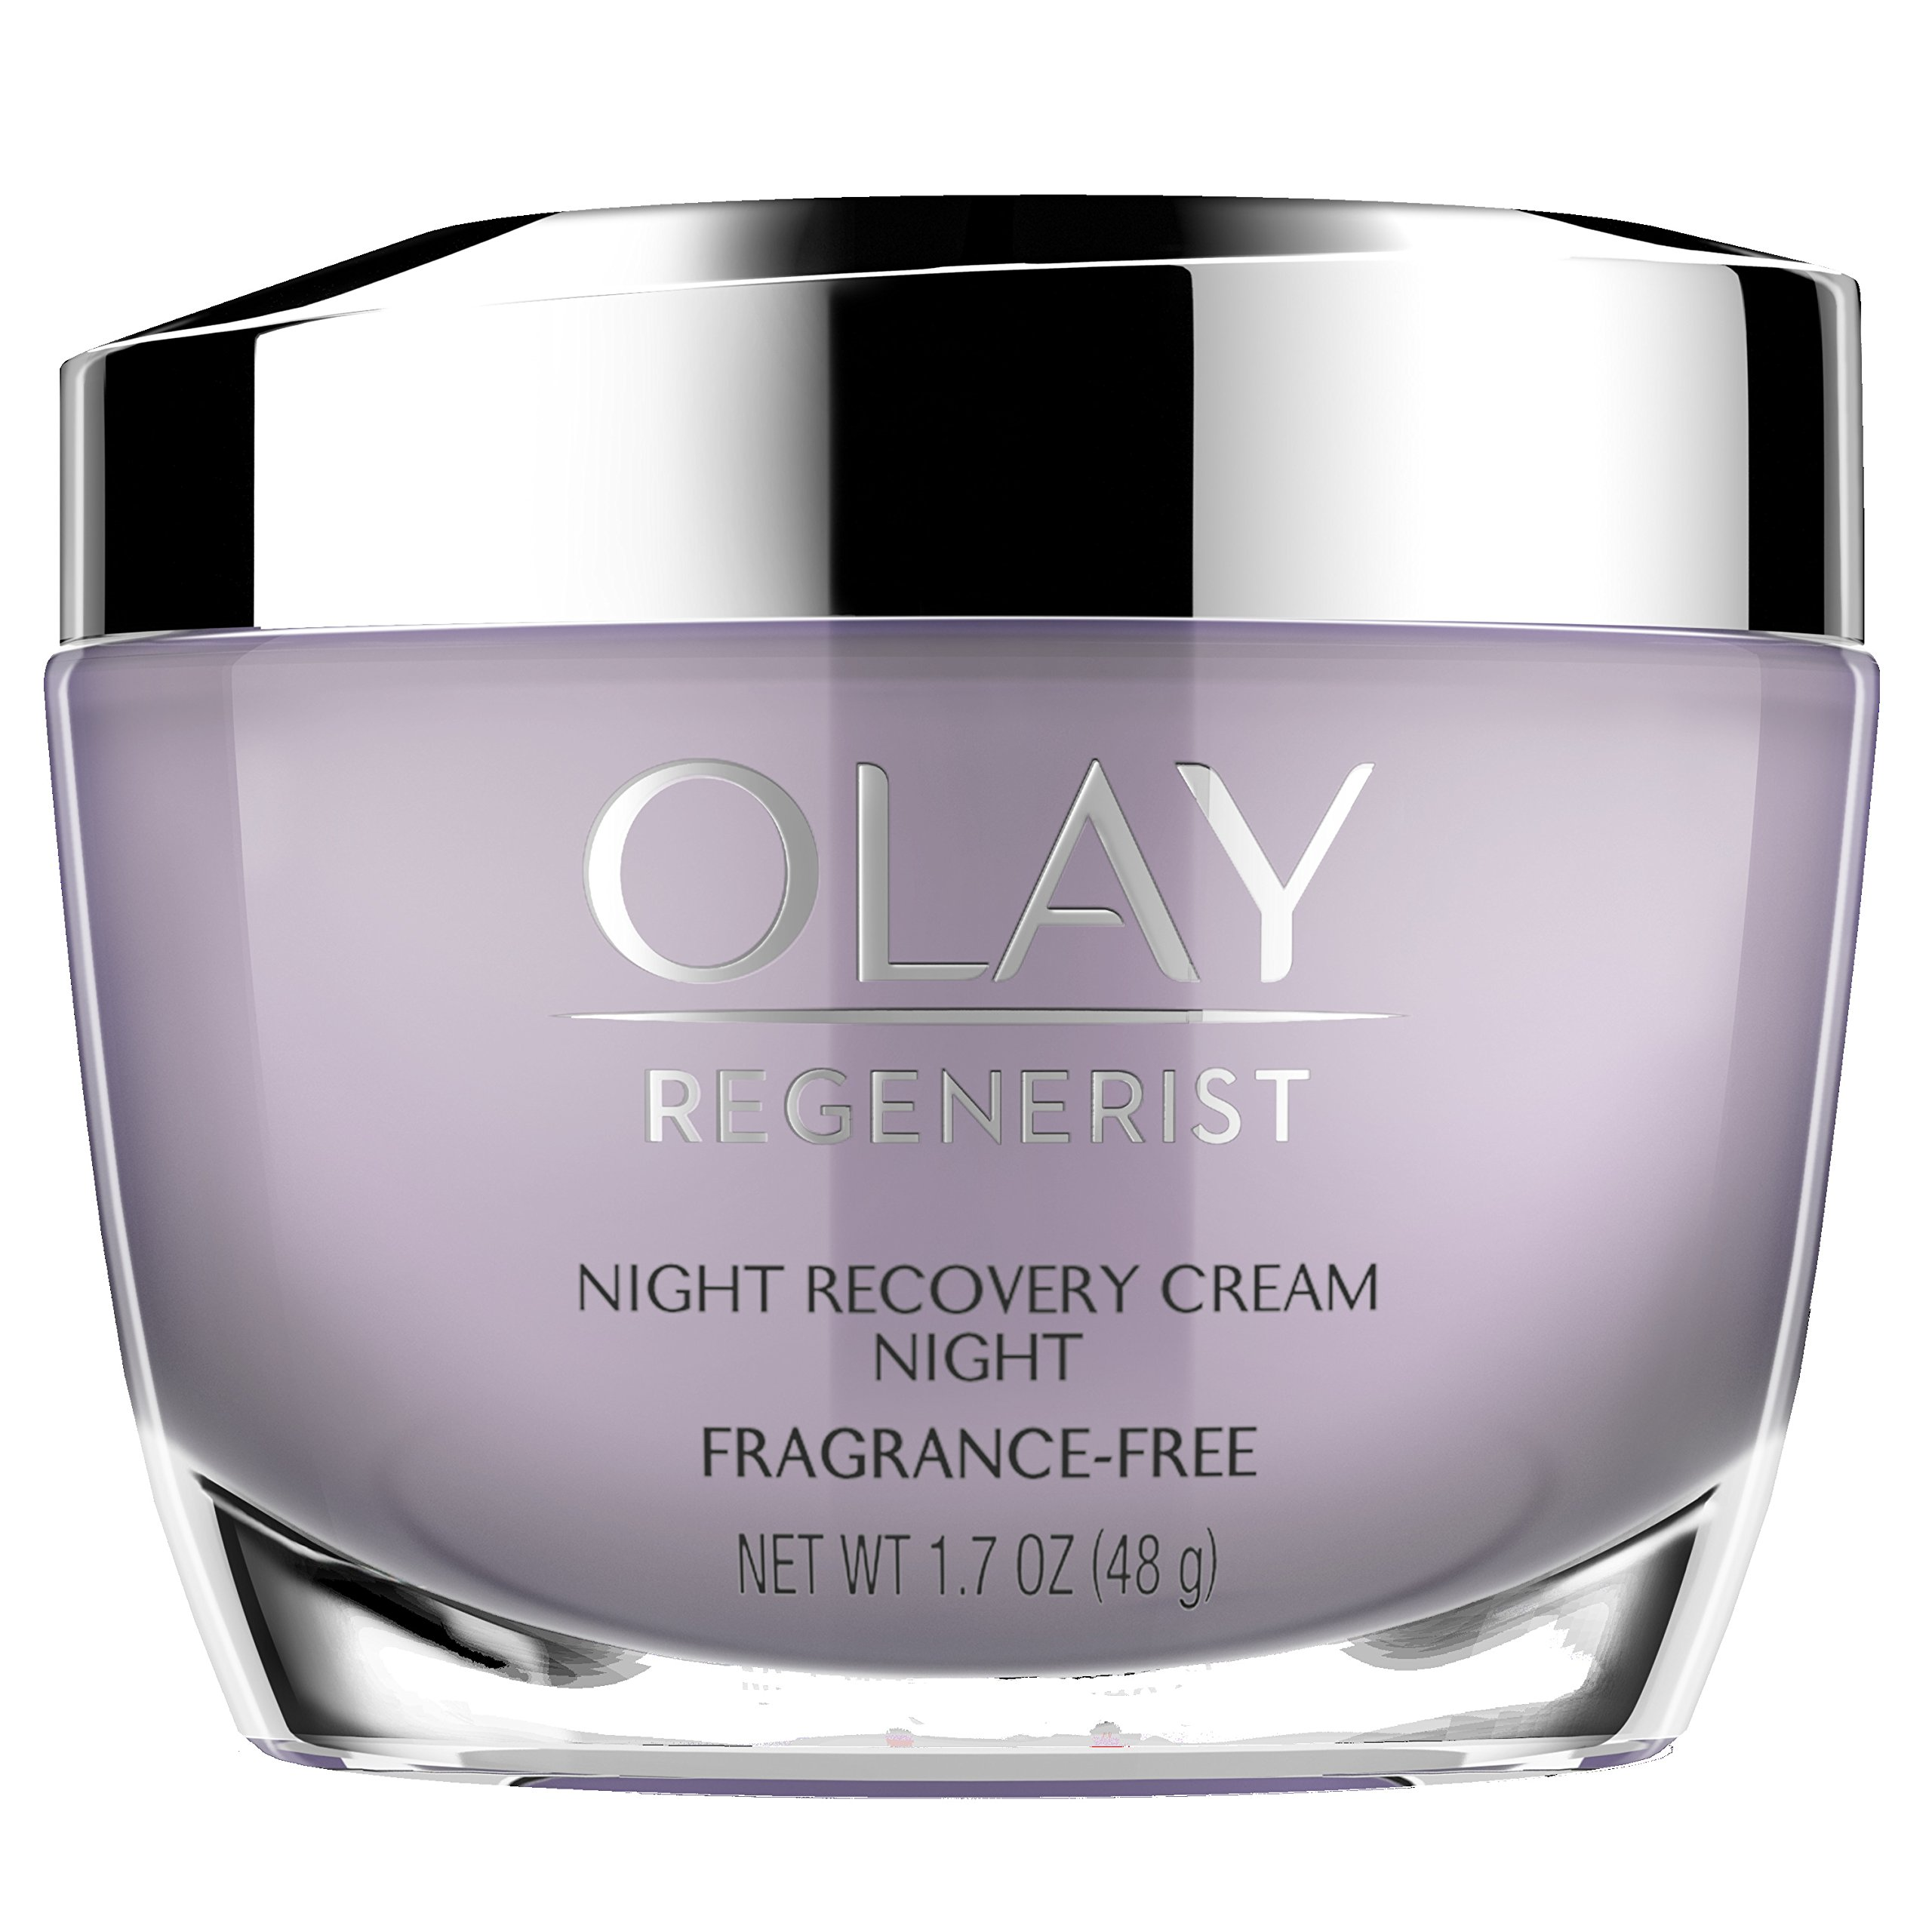 Night Cream by Olay Regenerist Night Recovery Cream & Face Moisturizer, 1.7 Ounce by Olay